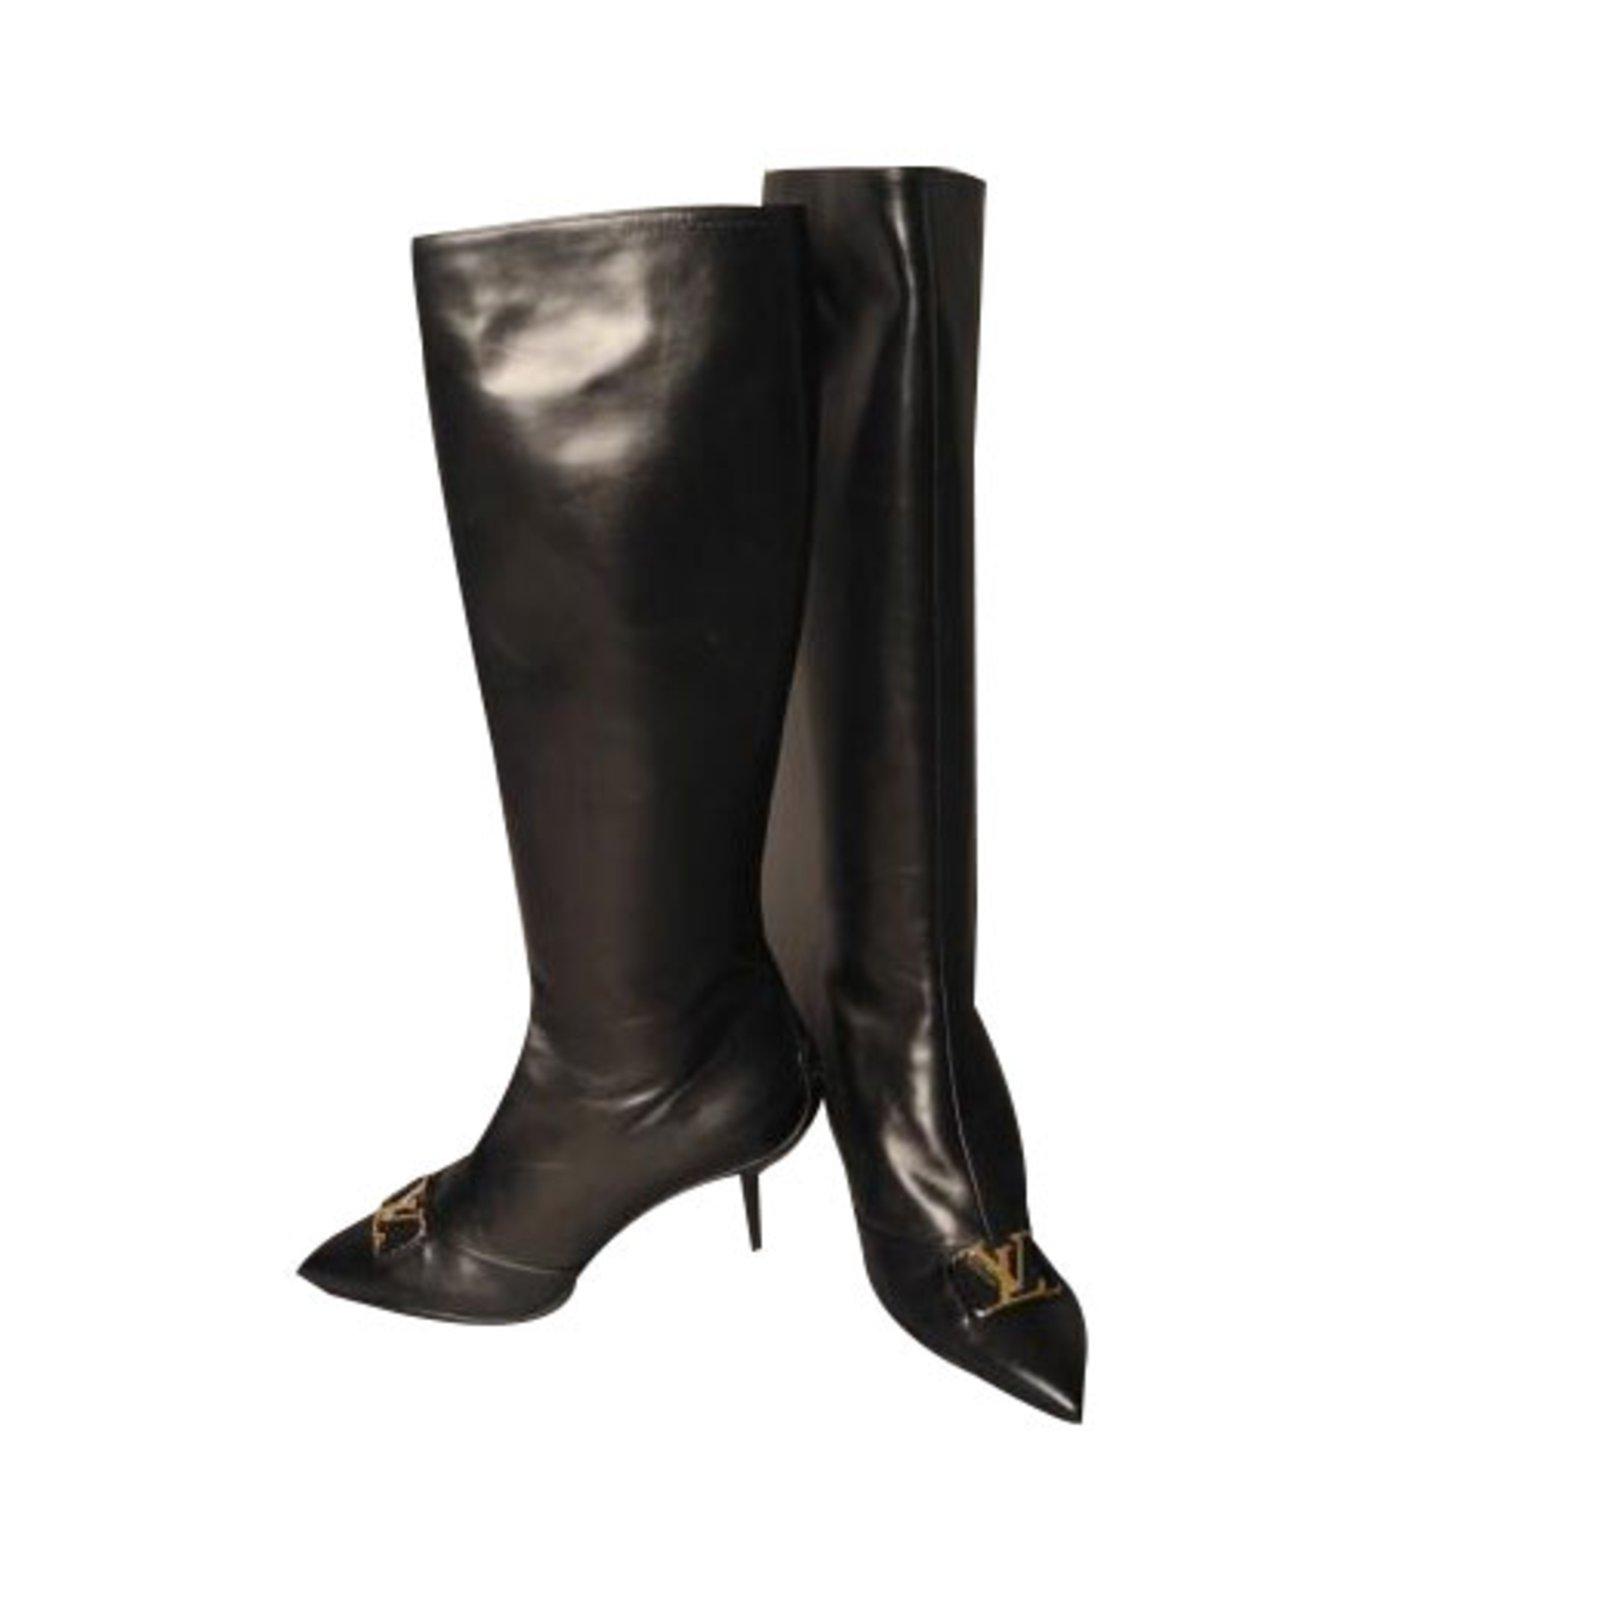 69cca5943b3 Louis Vuitton Boots Boots Leather Black ref.52493 - Joli Closet